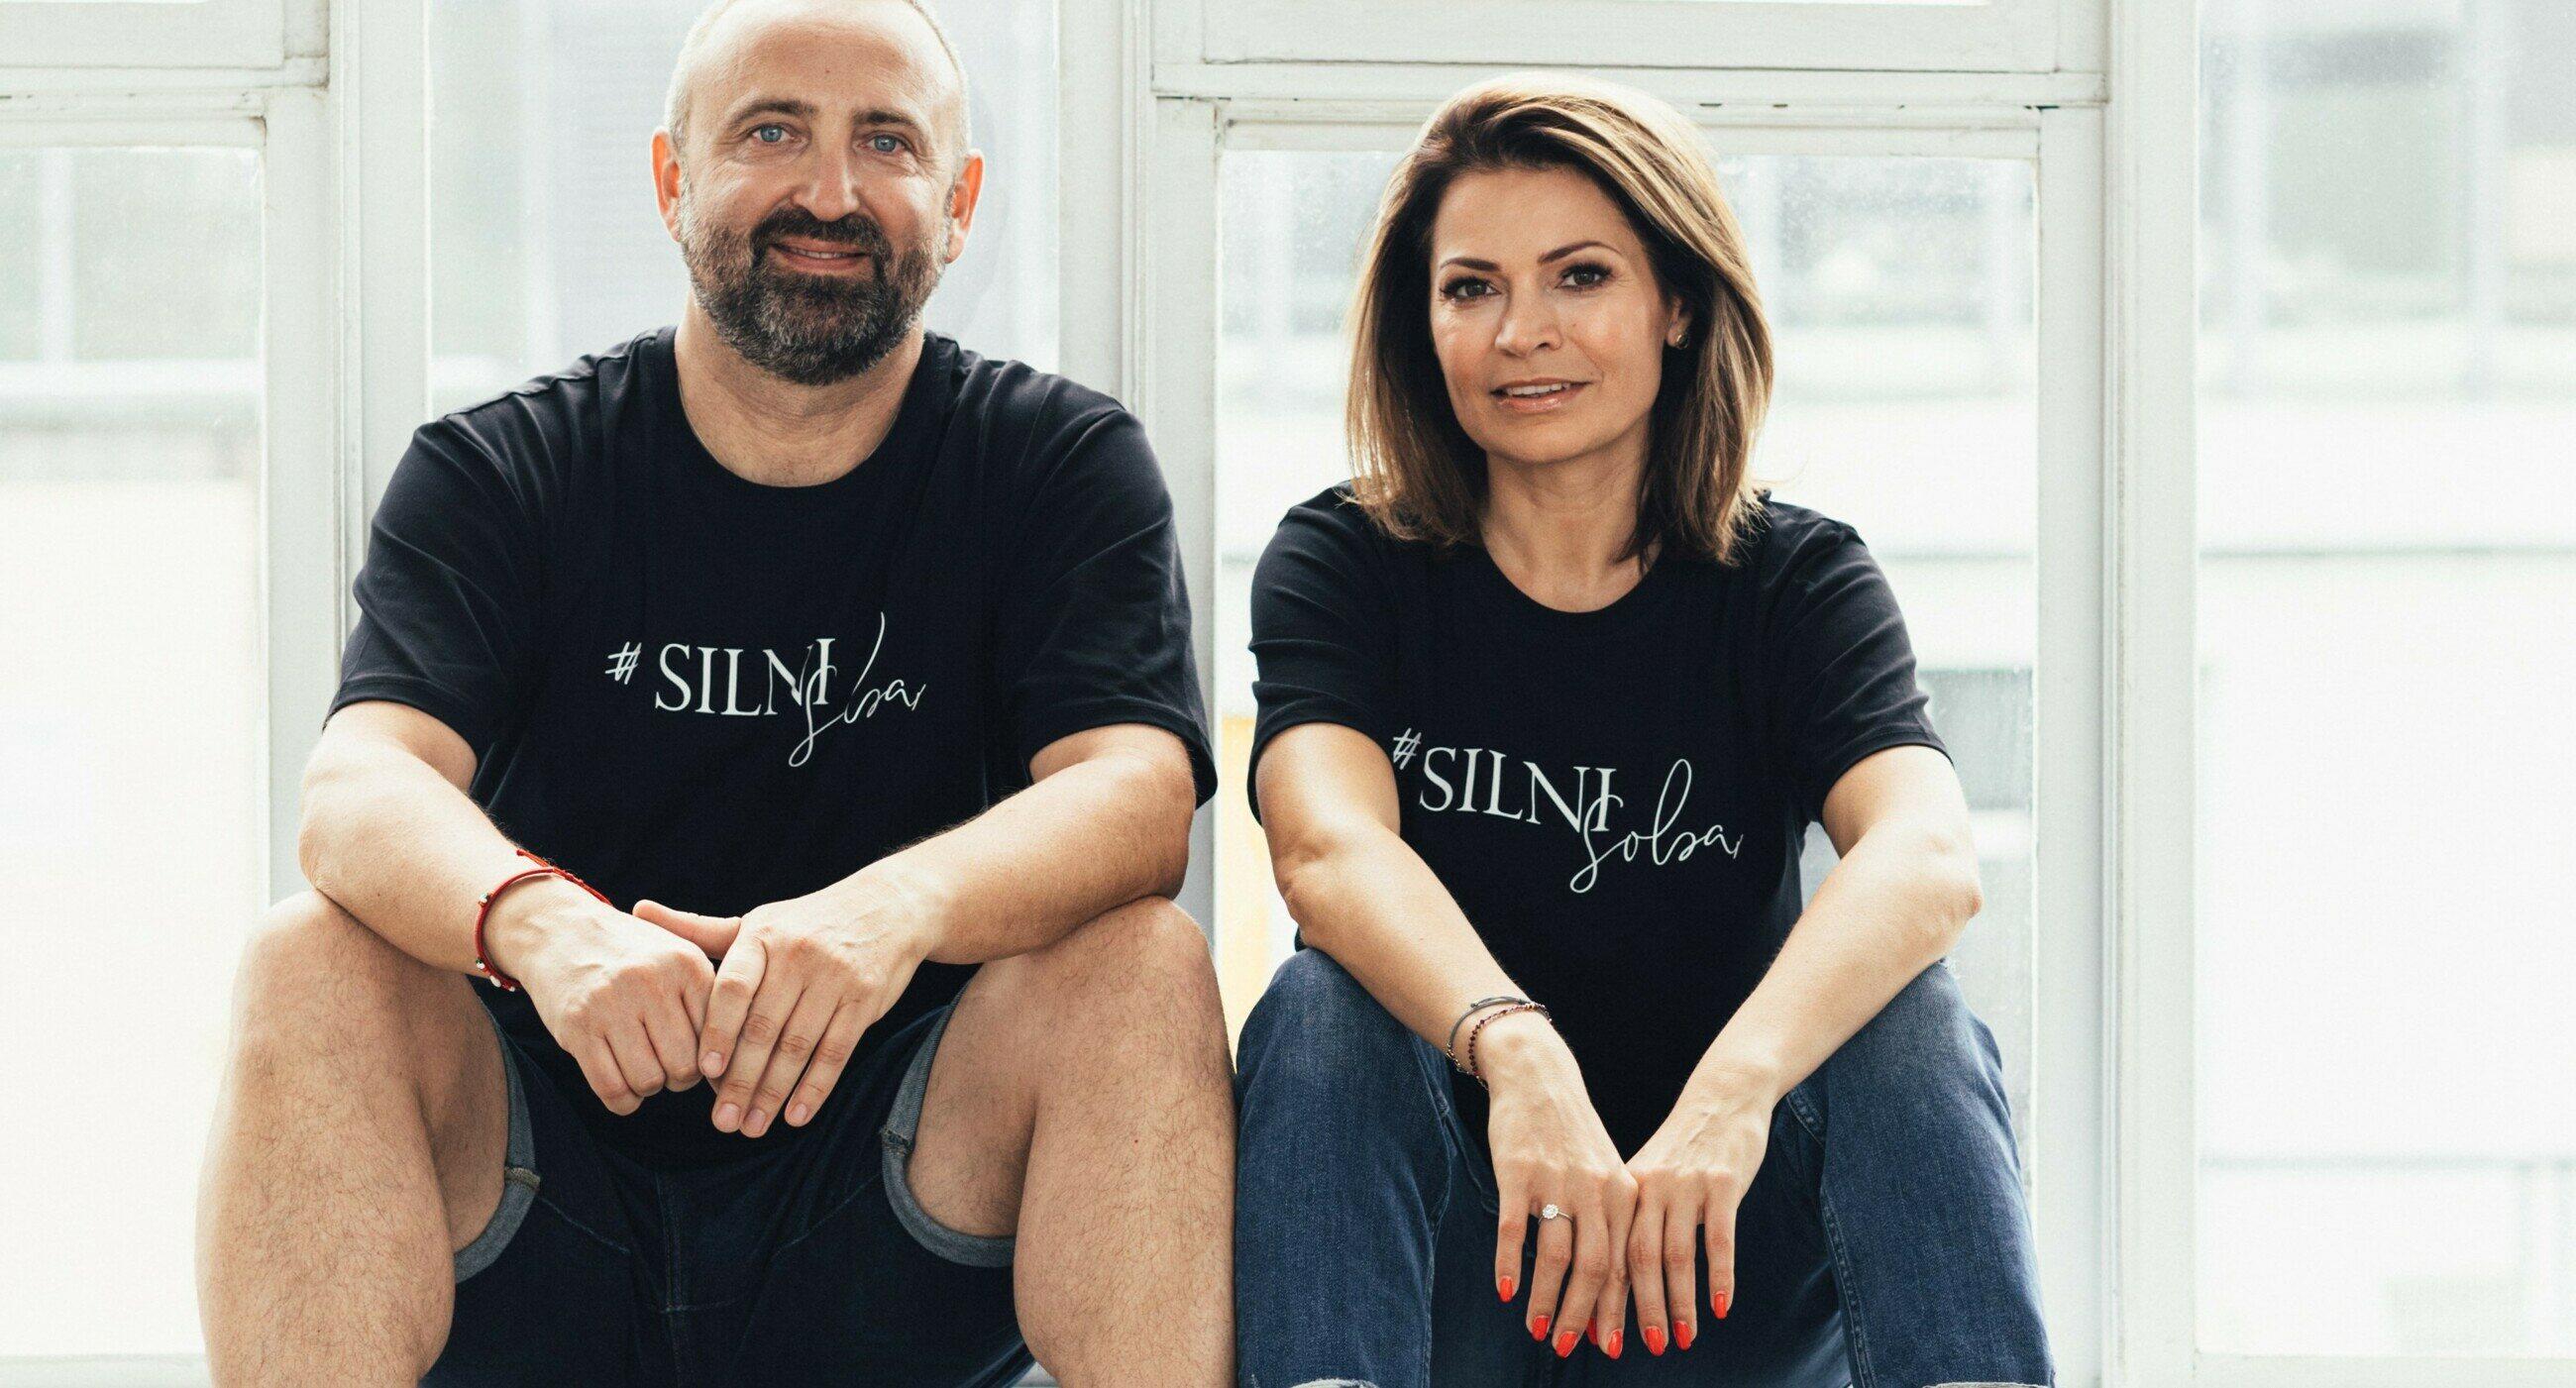 Robert Szulc i Joanna Górska, fot. Aneta Zamielska